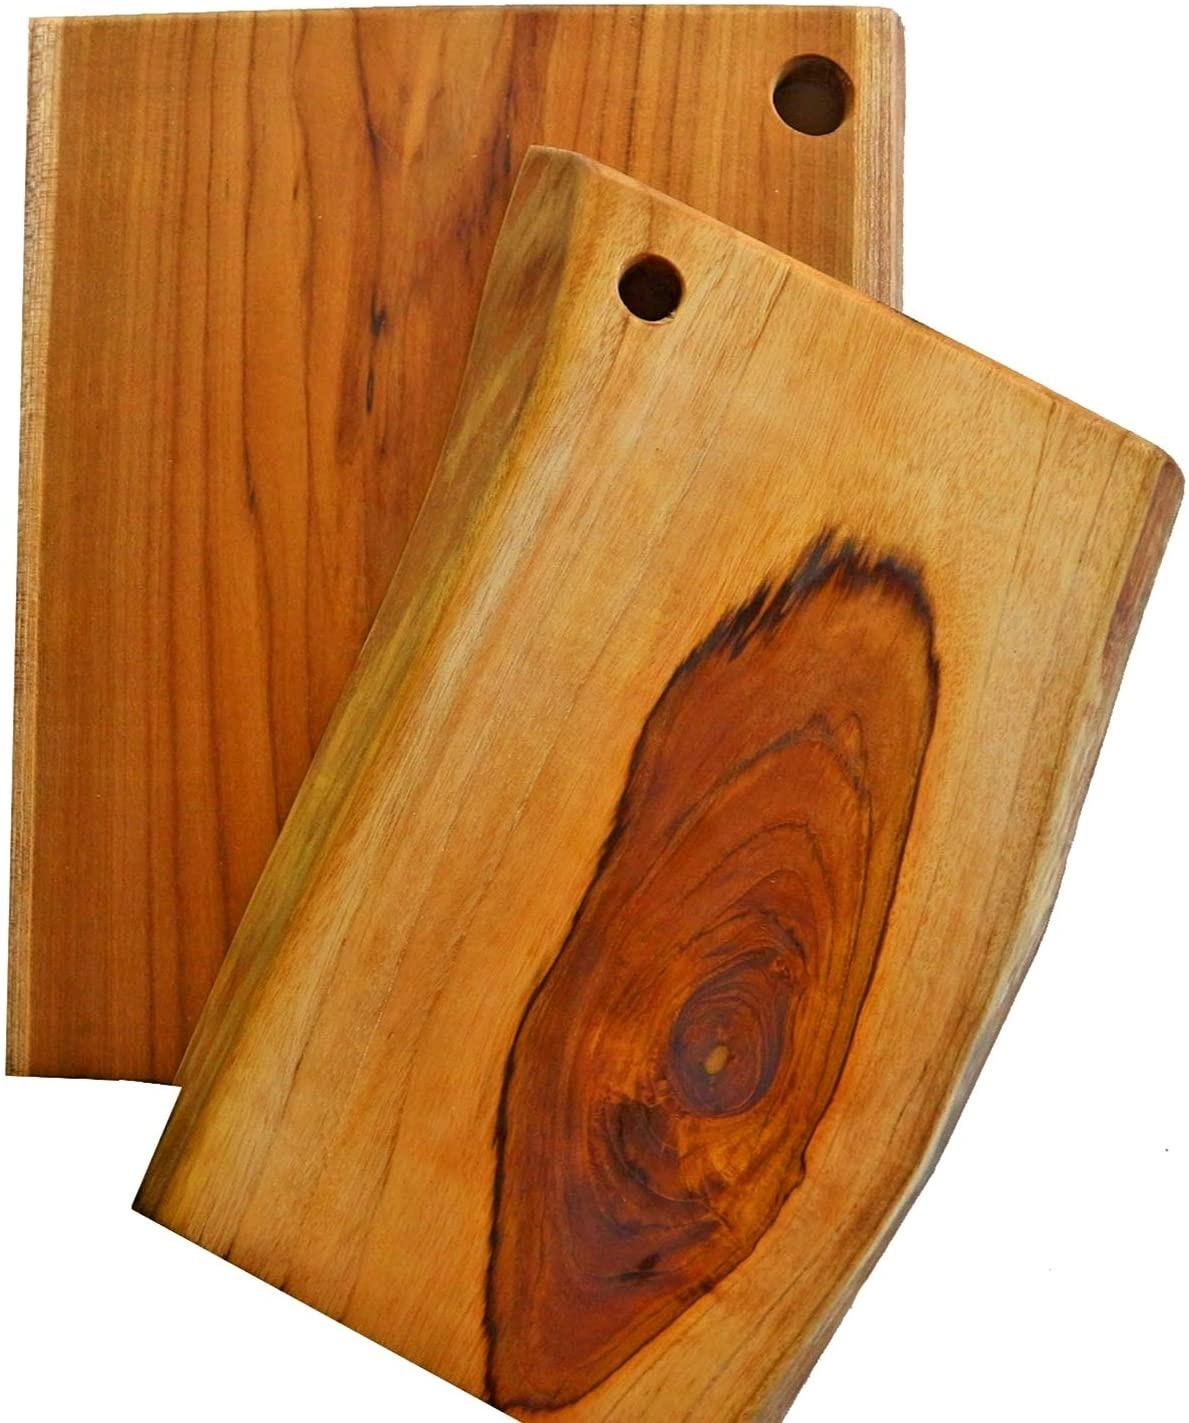 Ecowood Costa Rica Teak Wood Cutting Board for Kitchen